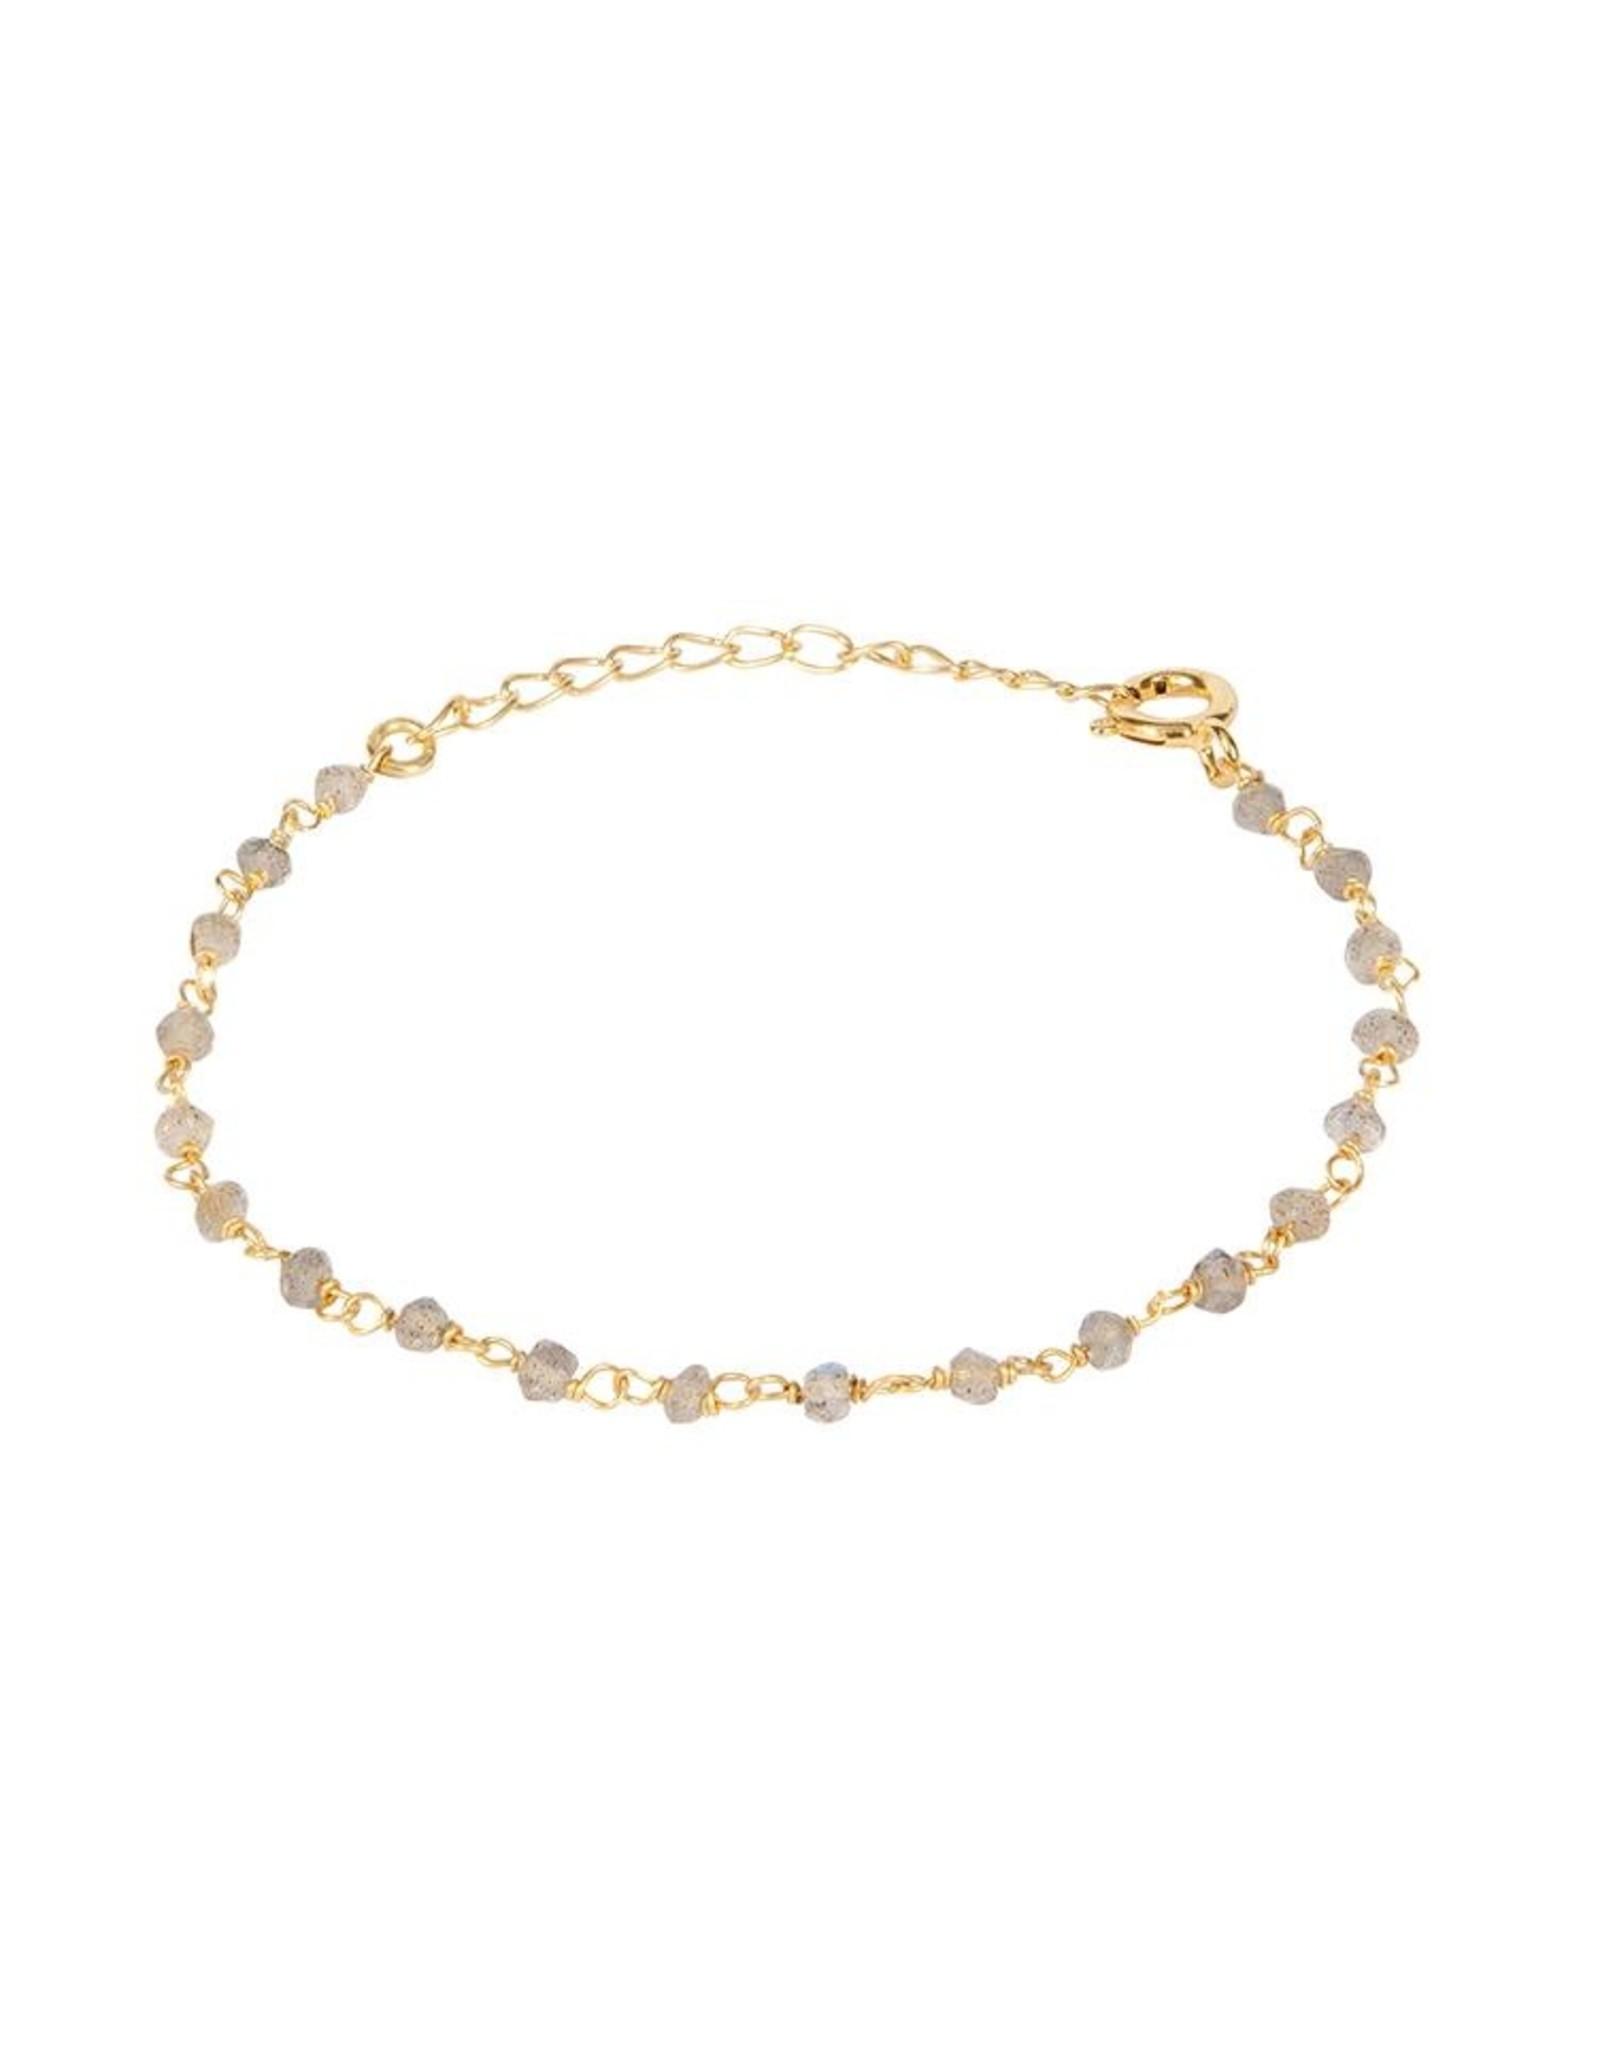 Armband Little Stones 925 Silber vergoldet labradorit